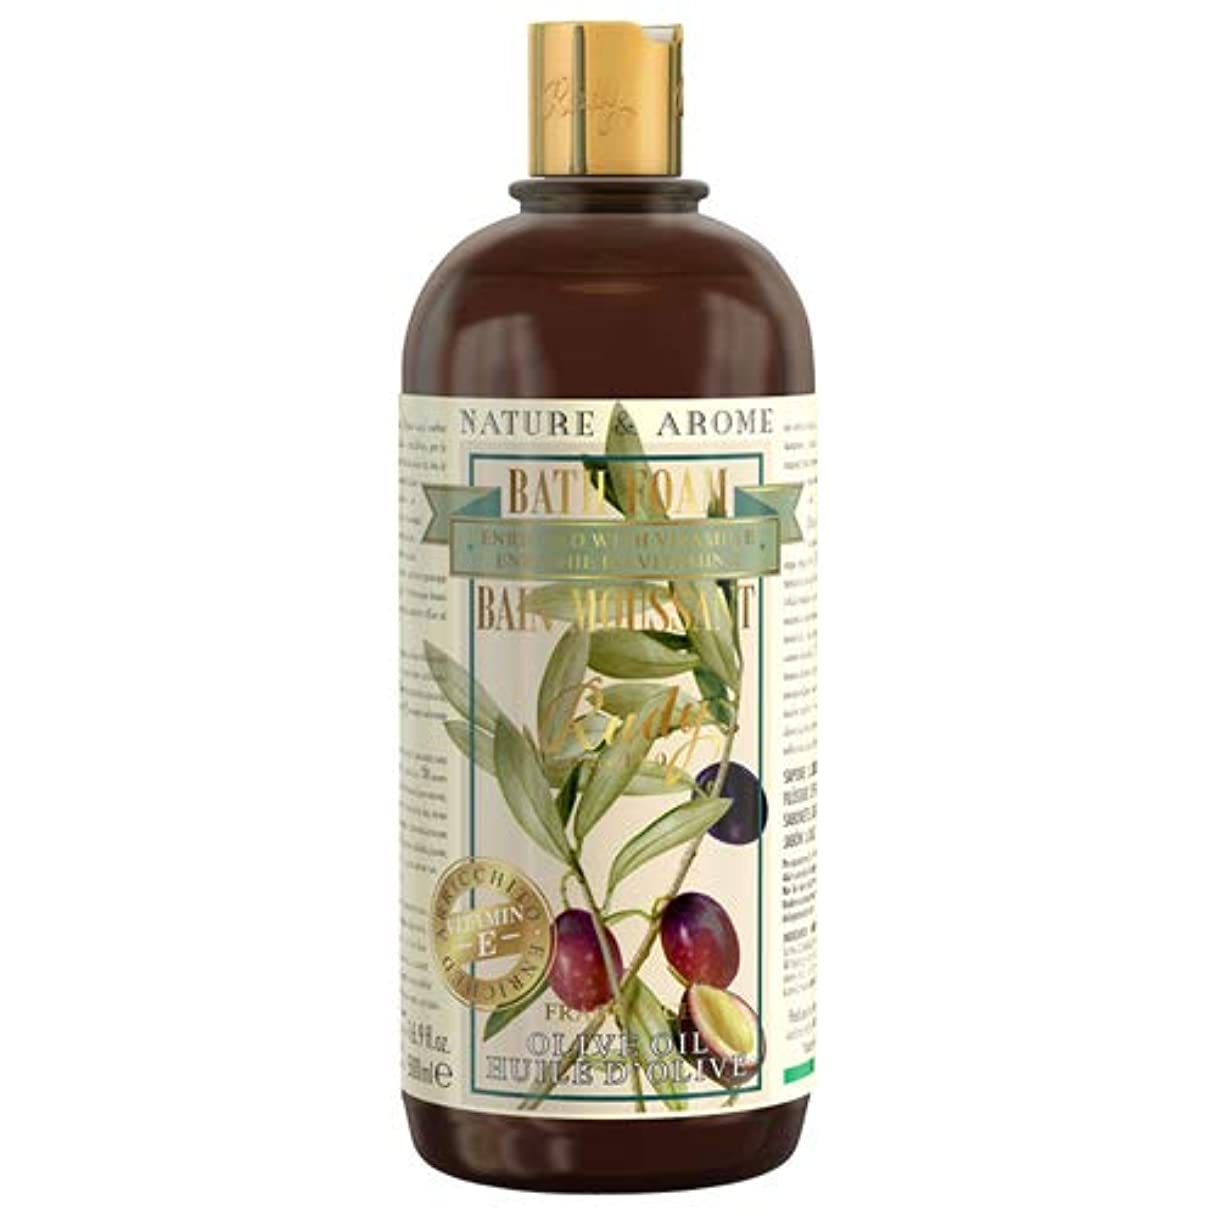 RUDY Nature&Arome Apothecary ネイチャーアロマ アポセカリー Bath & Shower Gel バス&シャワージェル Olive Oil オリーブオイル